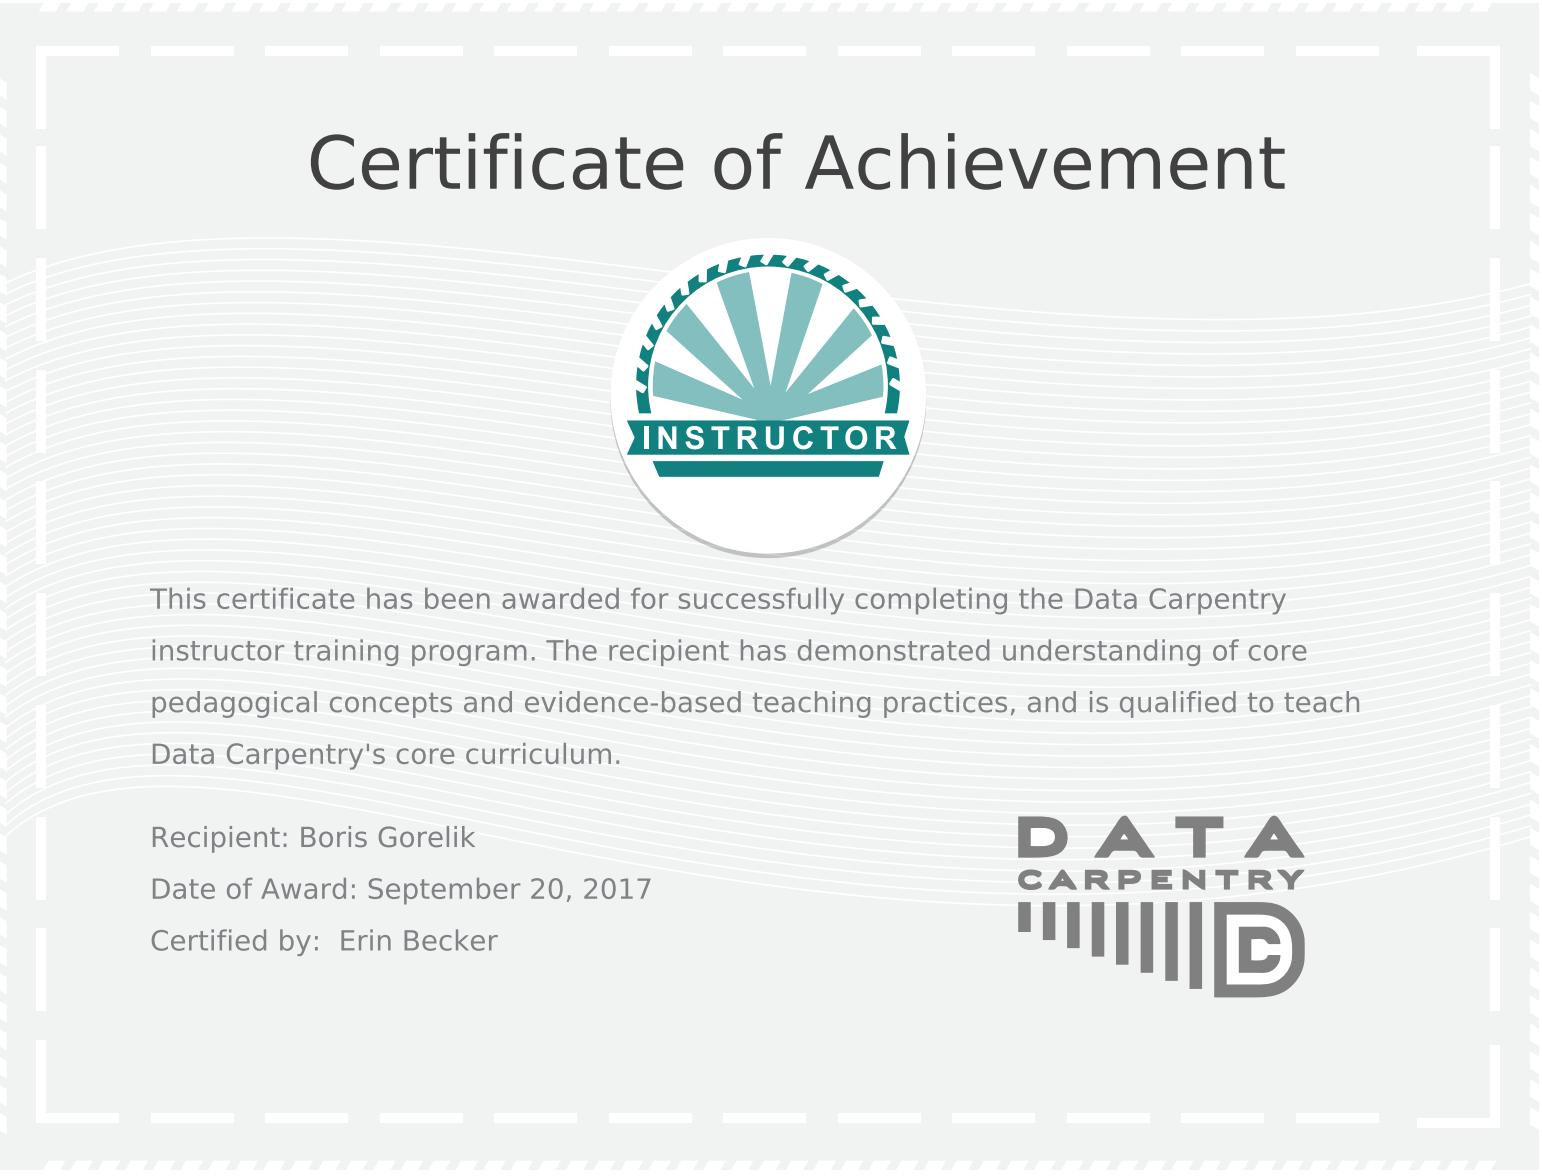 Certificate of achievement. Data Carpentry instructor